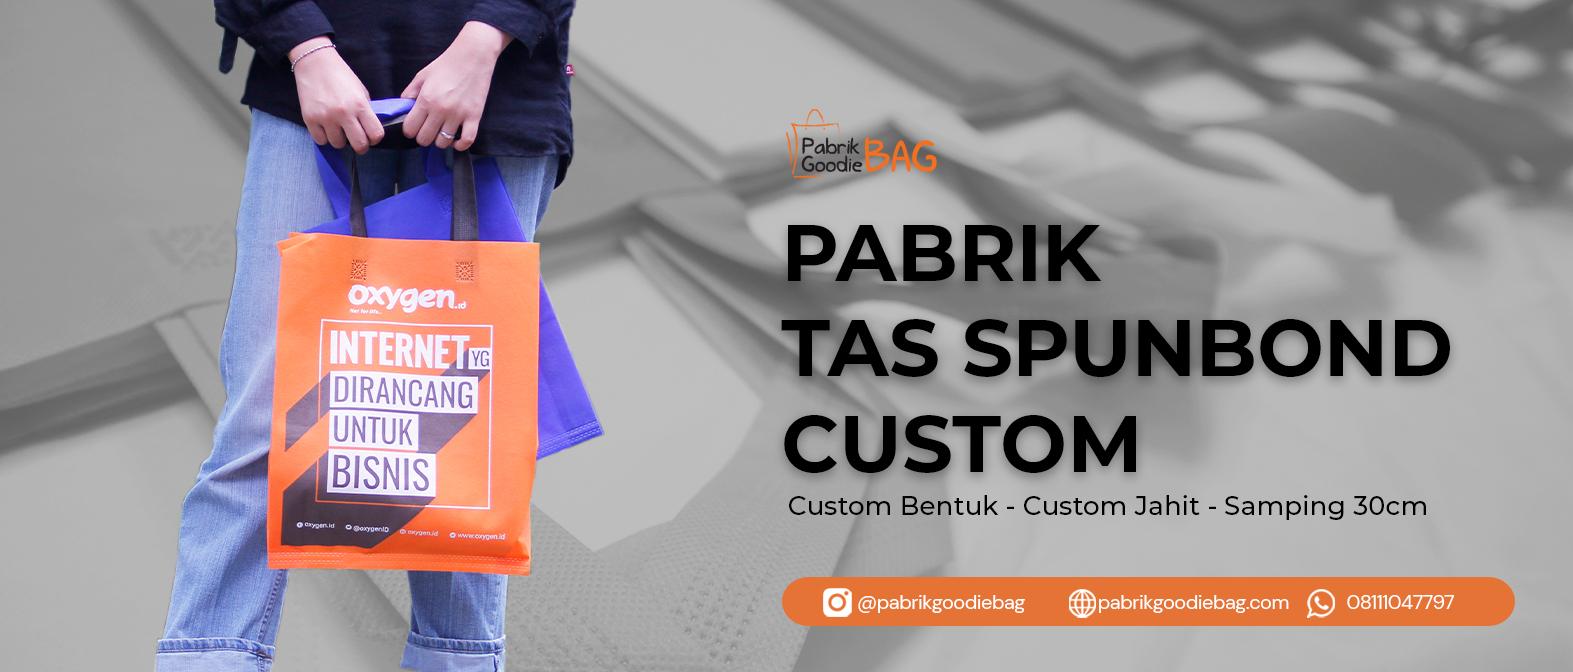 Pabrik Tas Spunbond Custom